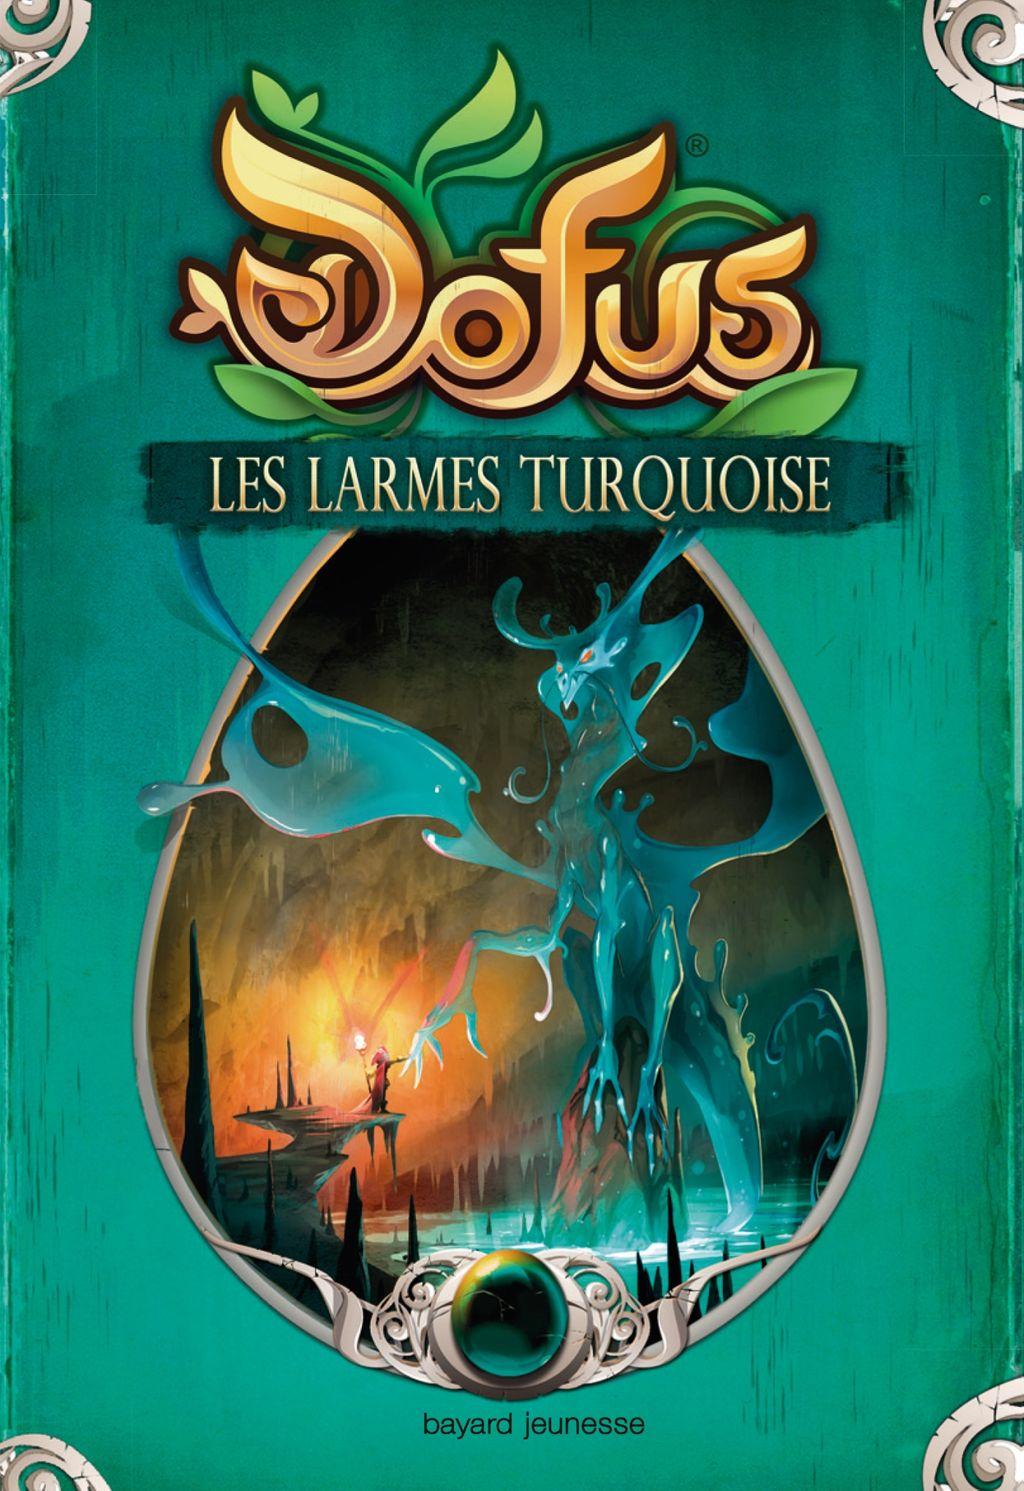 «Les larmes turquoise» cover